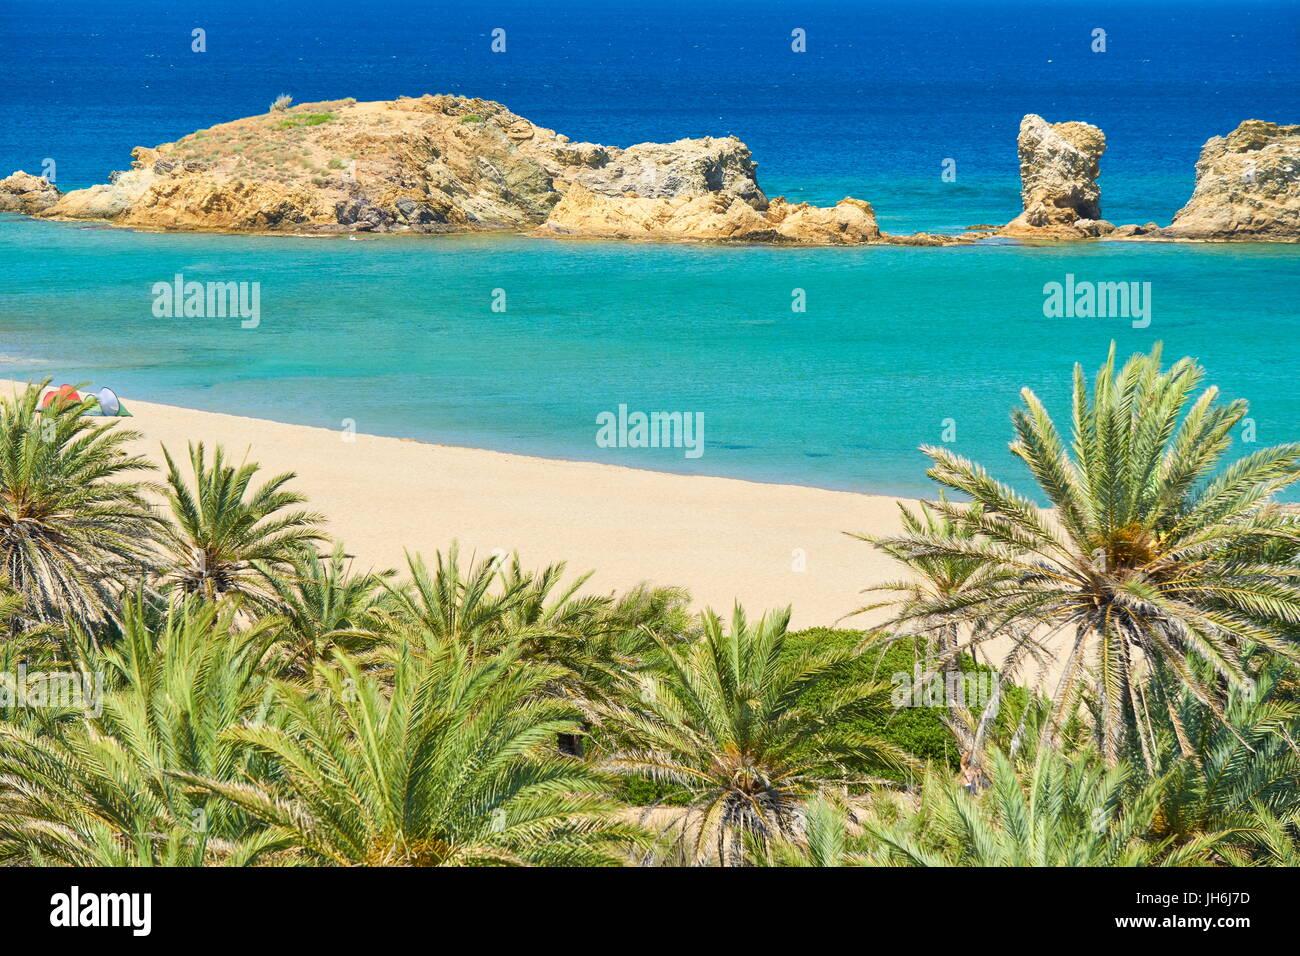 Vai Beach, Crete Island, Greece - Stock Image